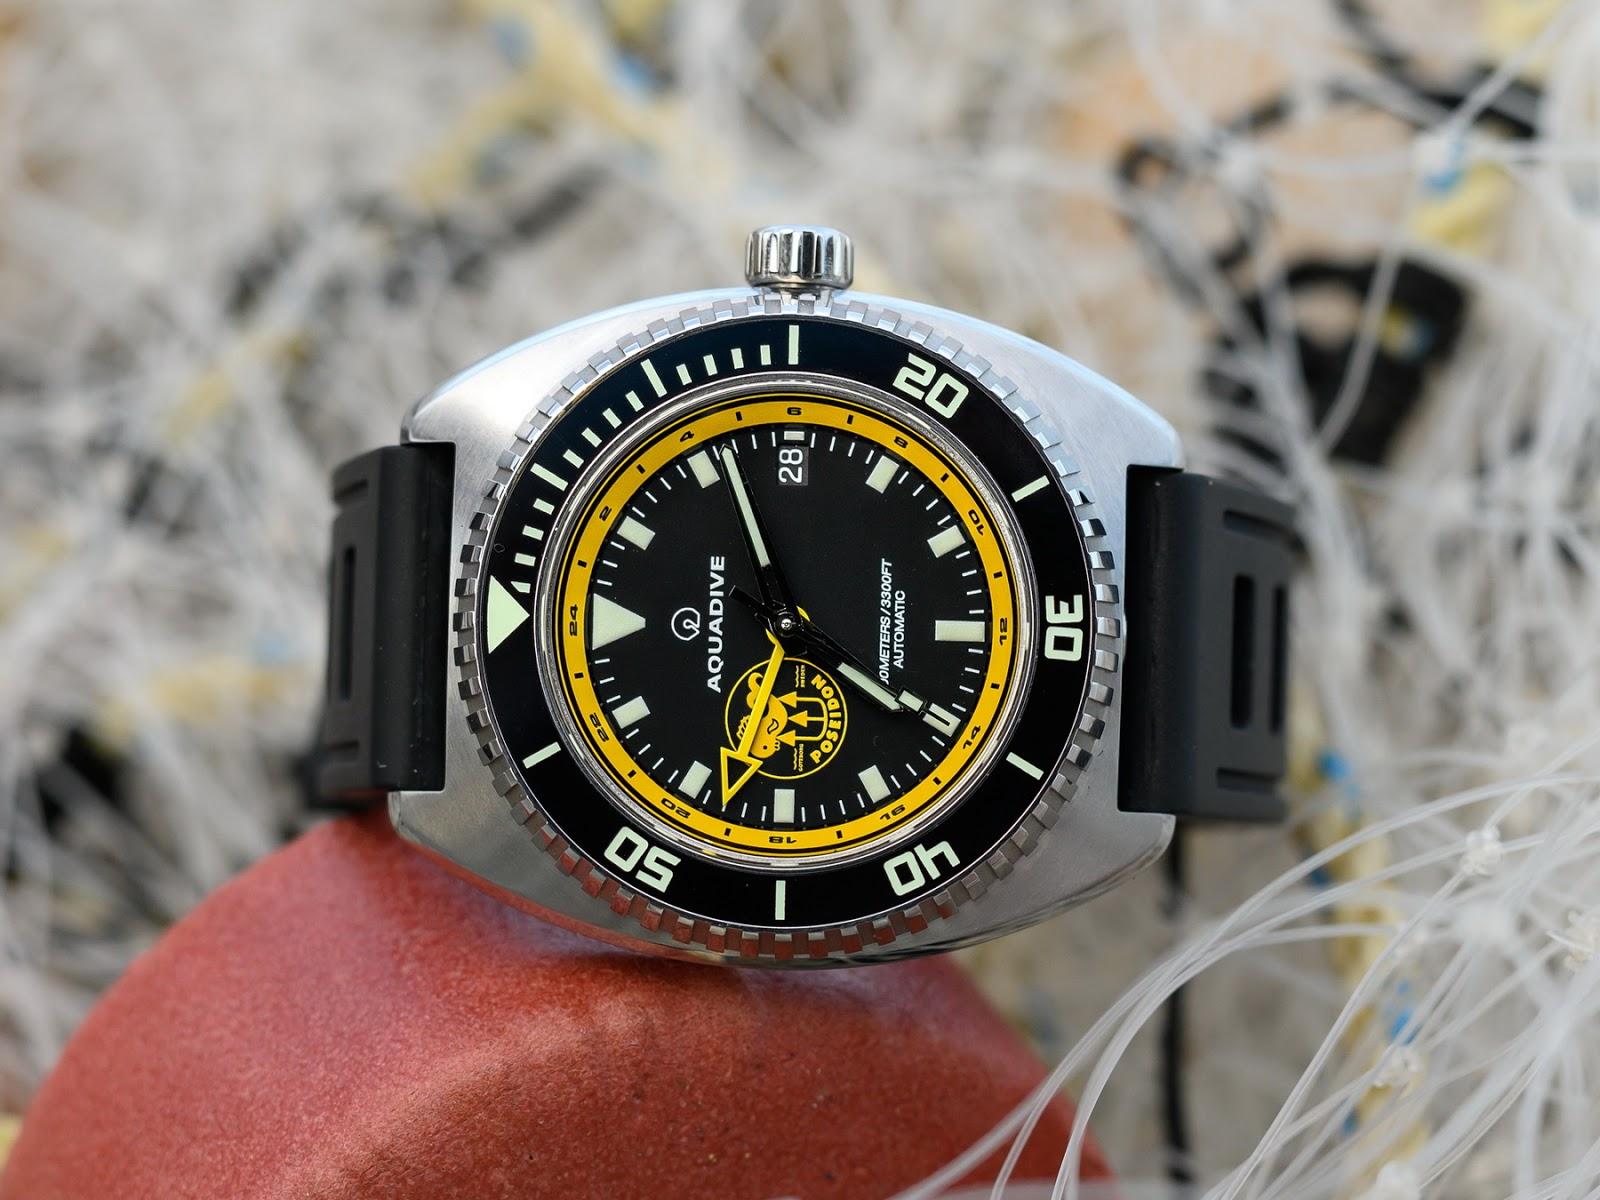 Aquadive's new Poseidon GMT AQUADIVE+Bathyscaphe+100+GMT+POSEIDON+13